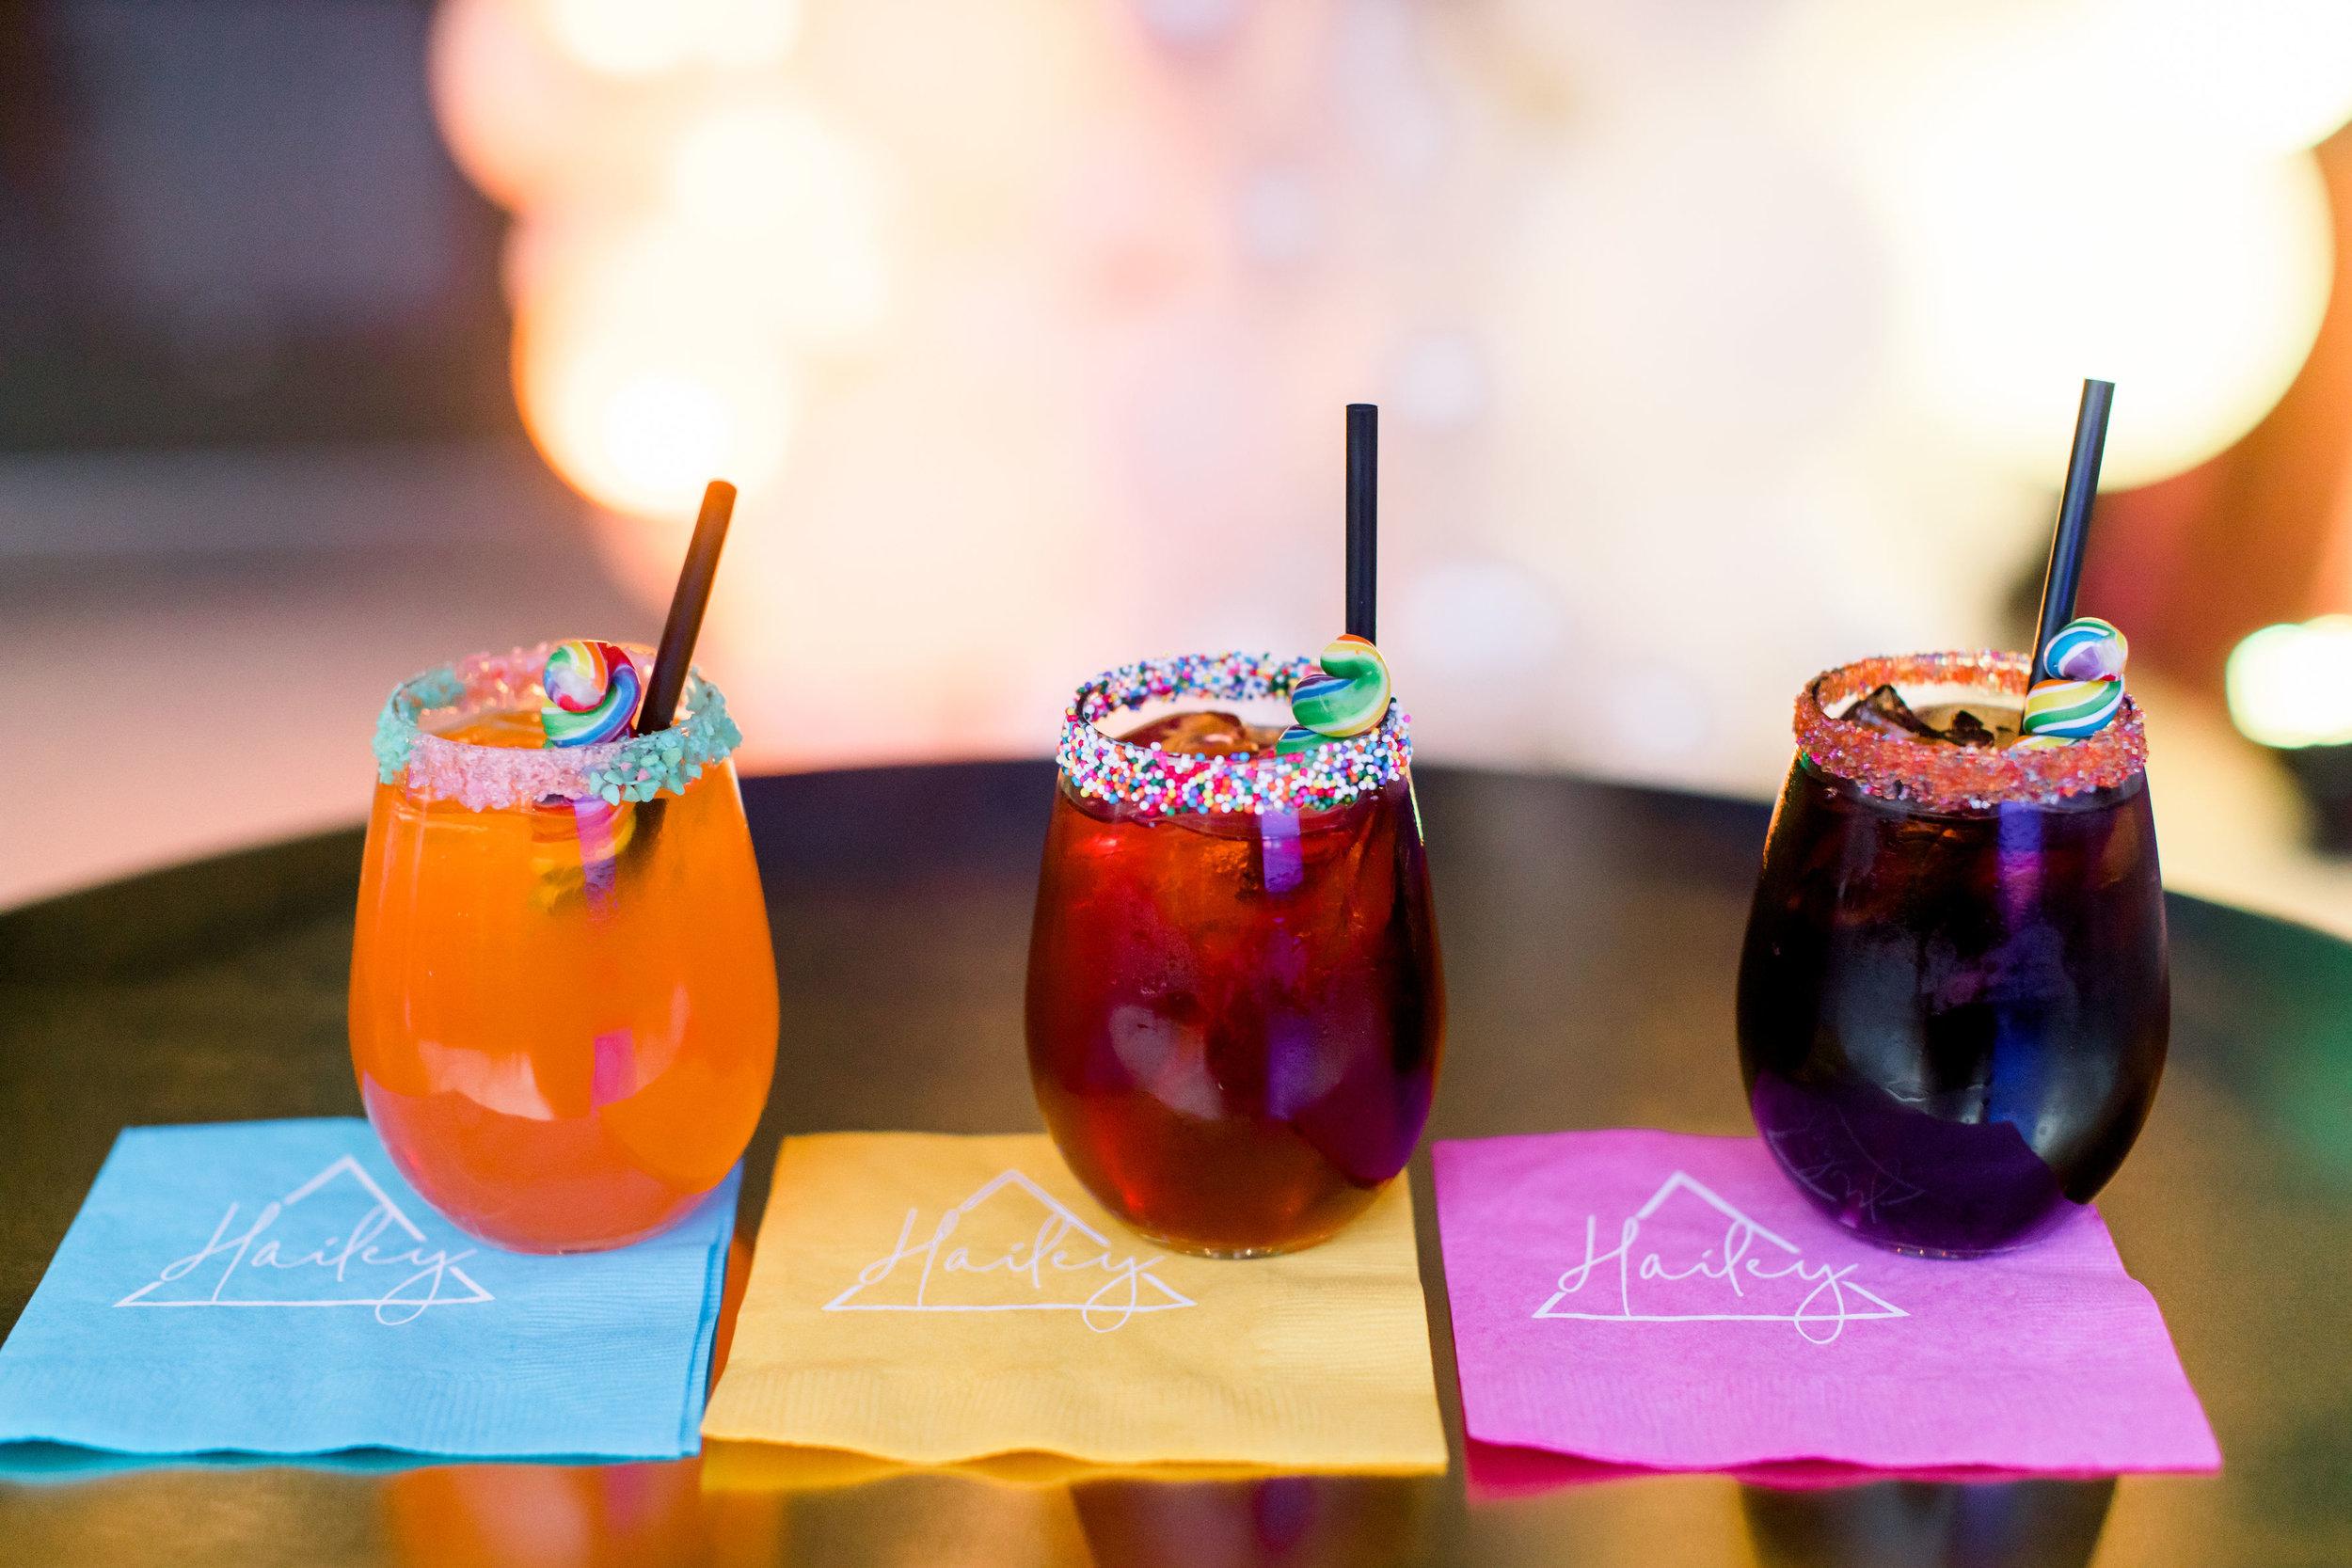 42 custom mocktail custom cocktail personalized logo cocktail napkins cocktail hour specialty cocktails Life Design Events photos by Stephanie Heymann Photography.jpg